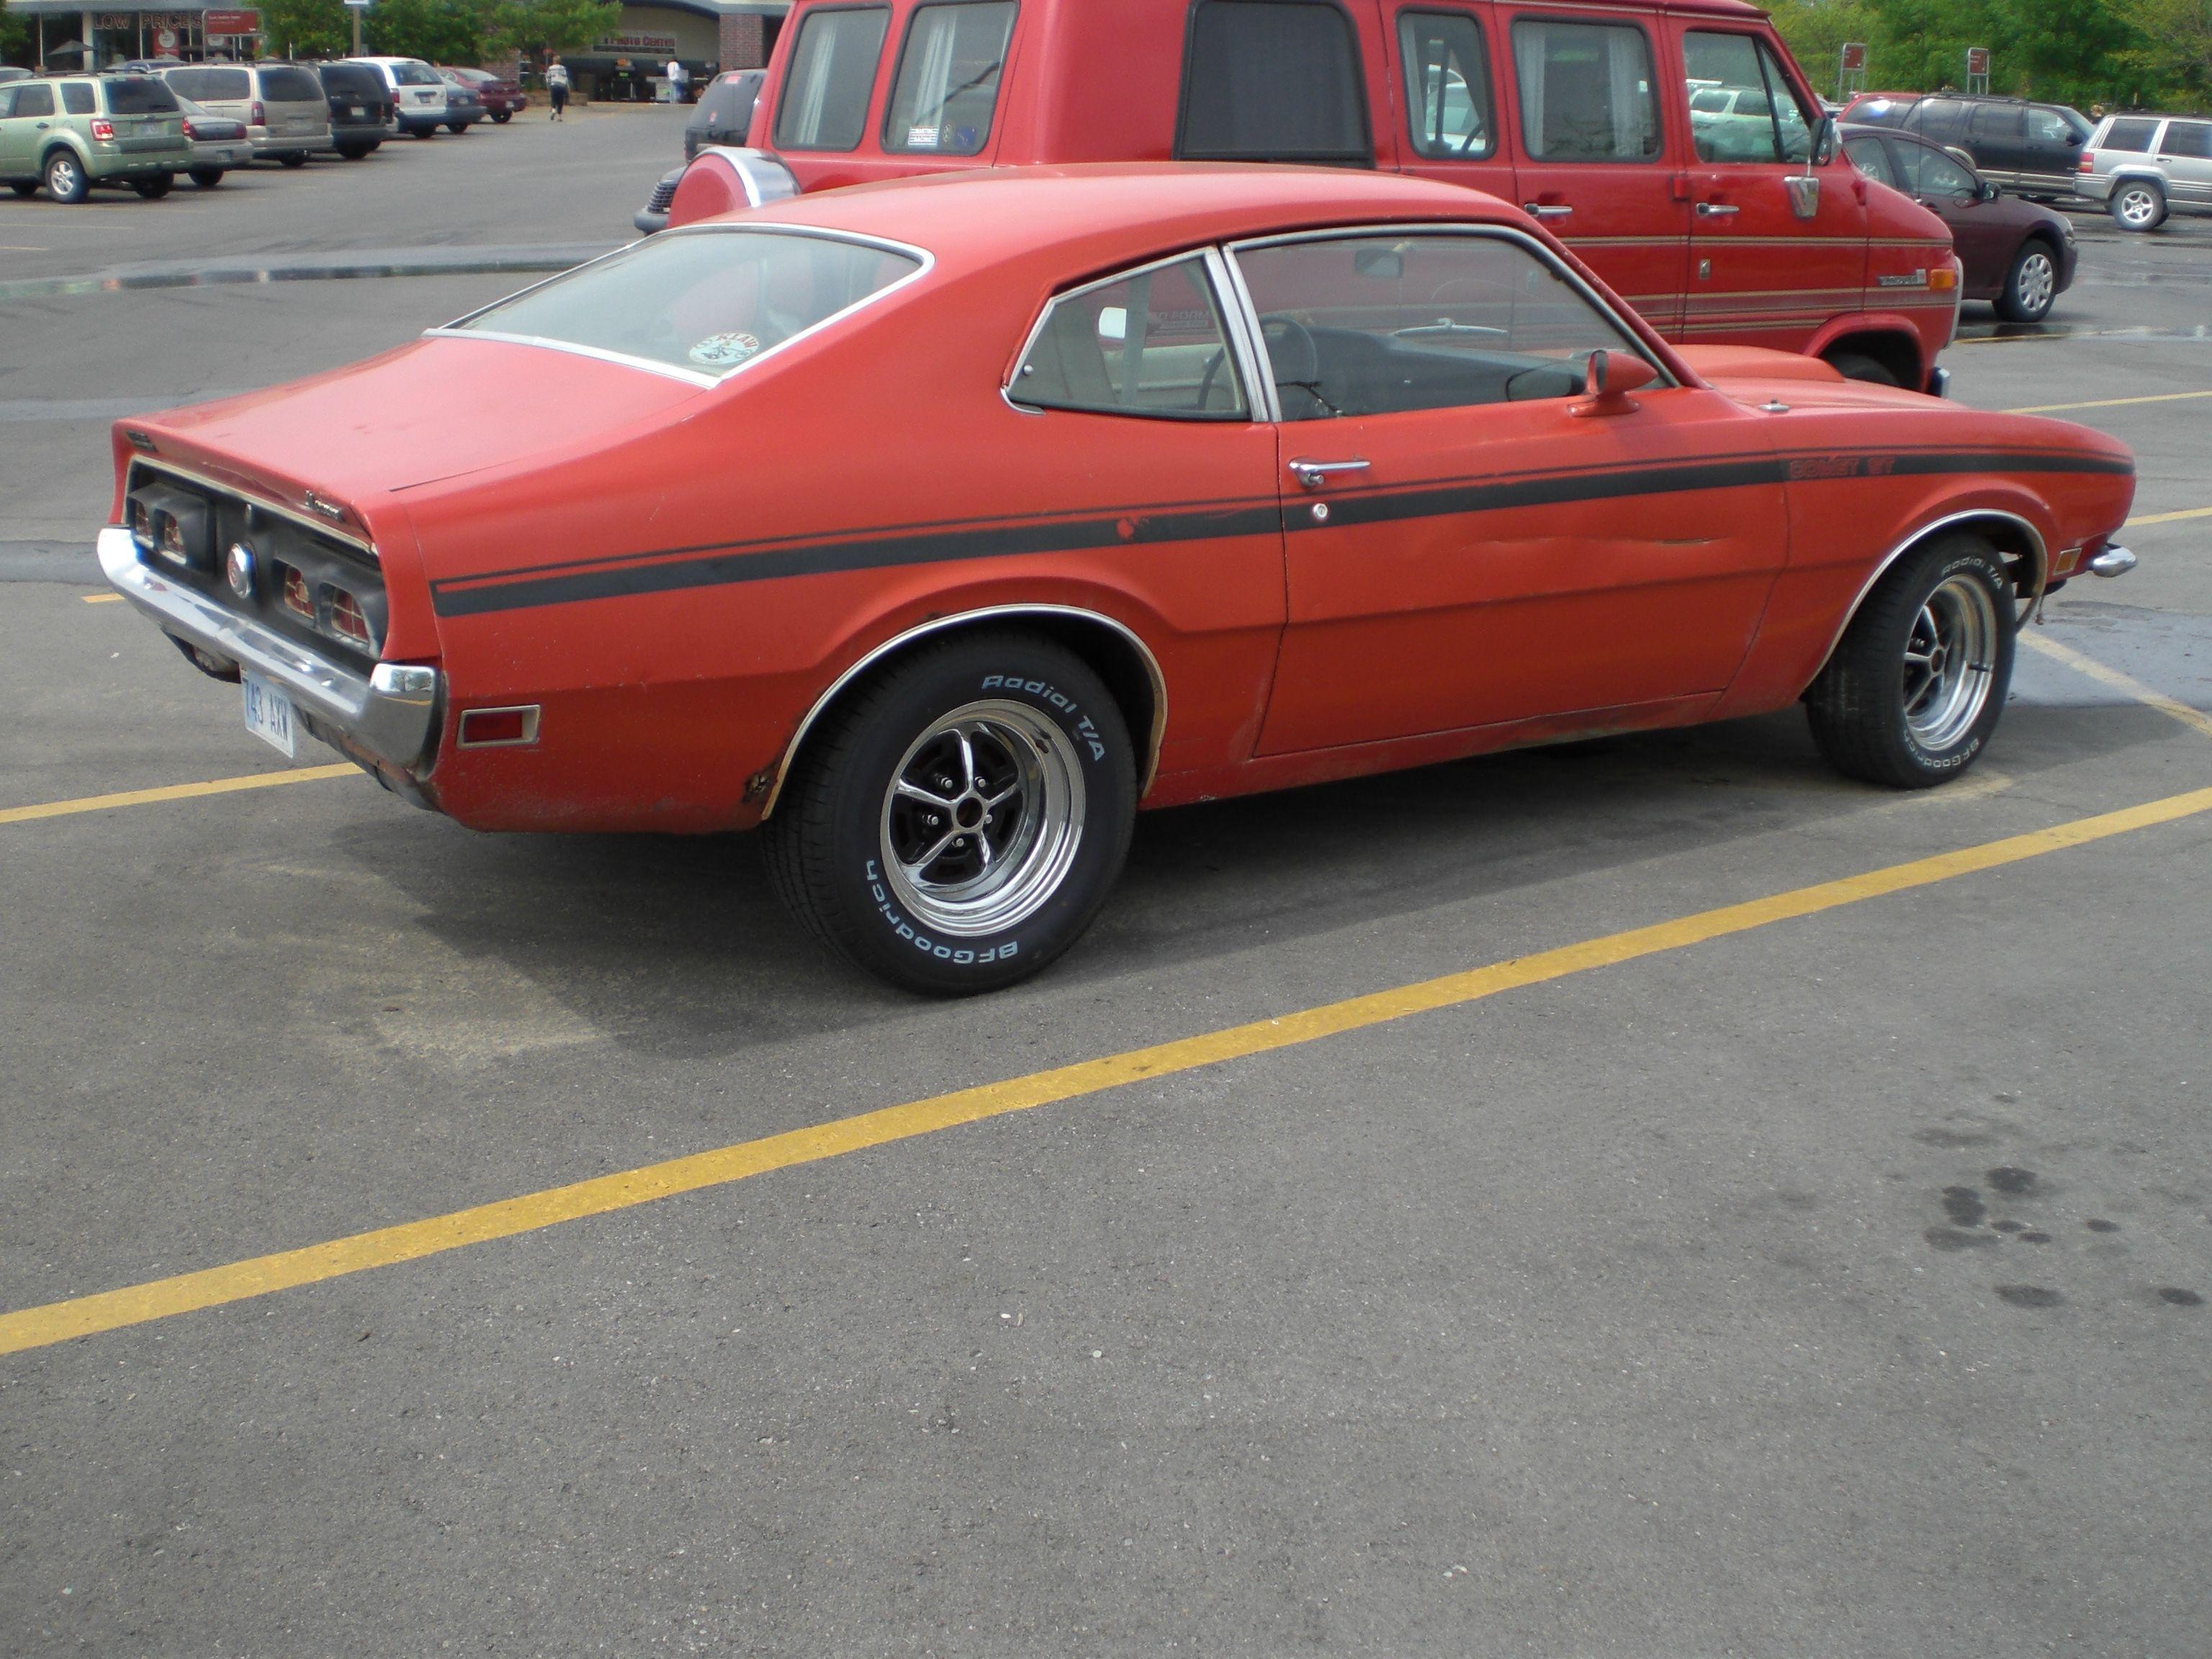 72 comet gt | Cars | Lincoln mercury, Mercury, Classic cars